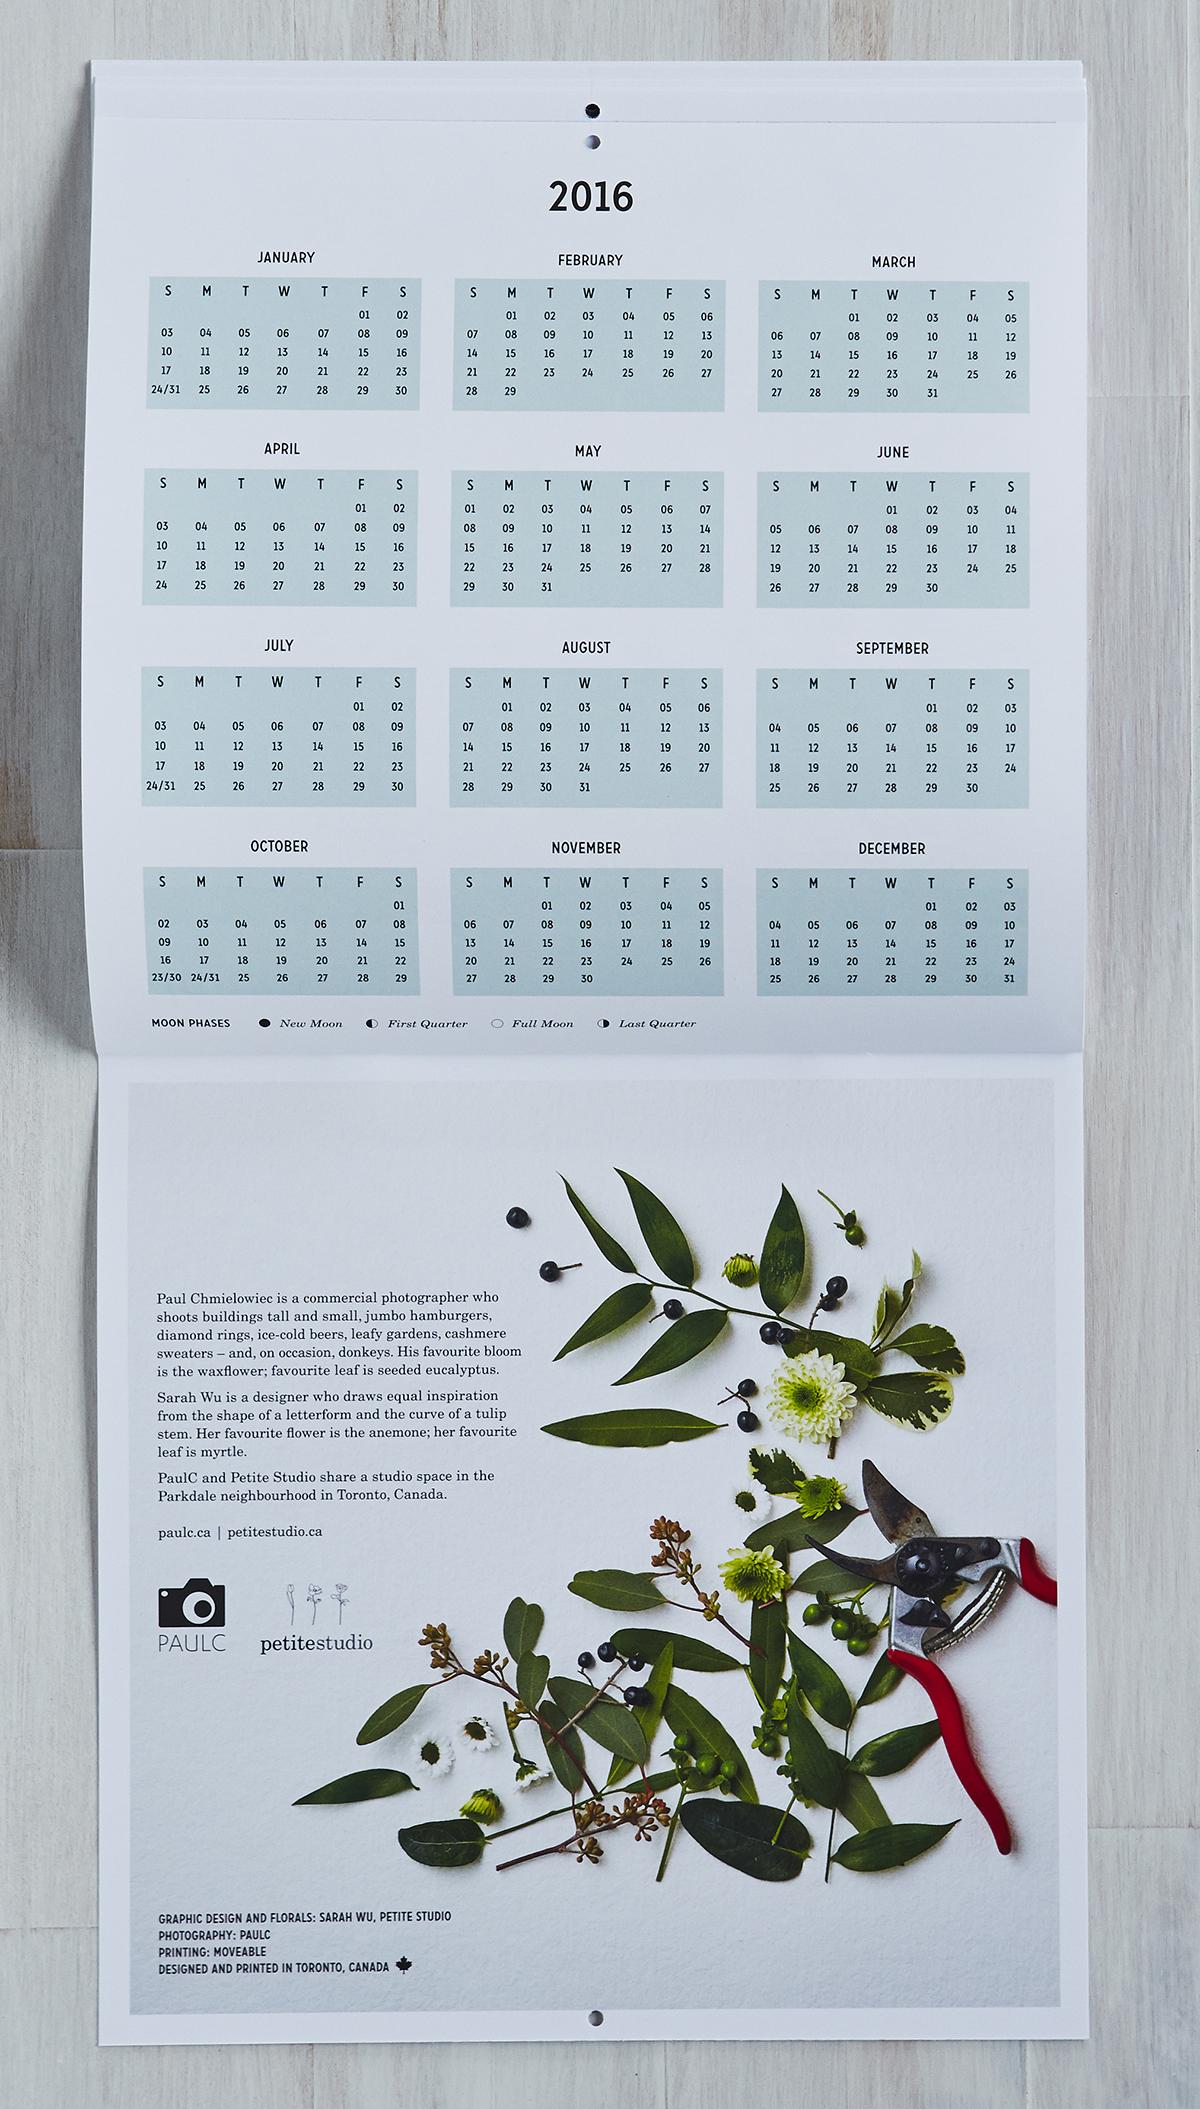 Petal + Leaf. Calendar design collaboration with Paul C, 2015